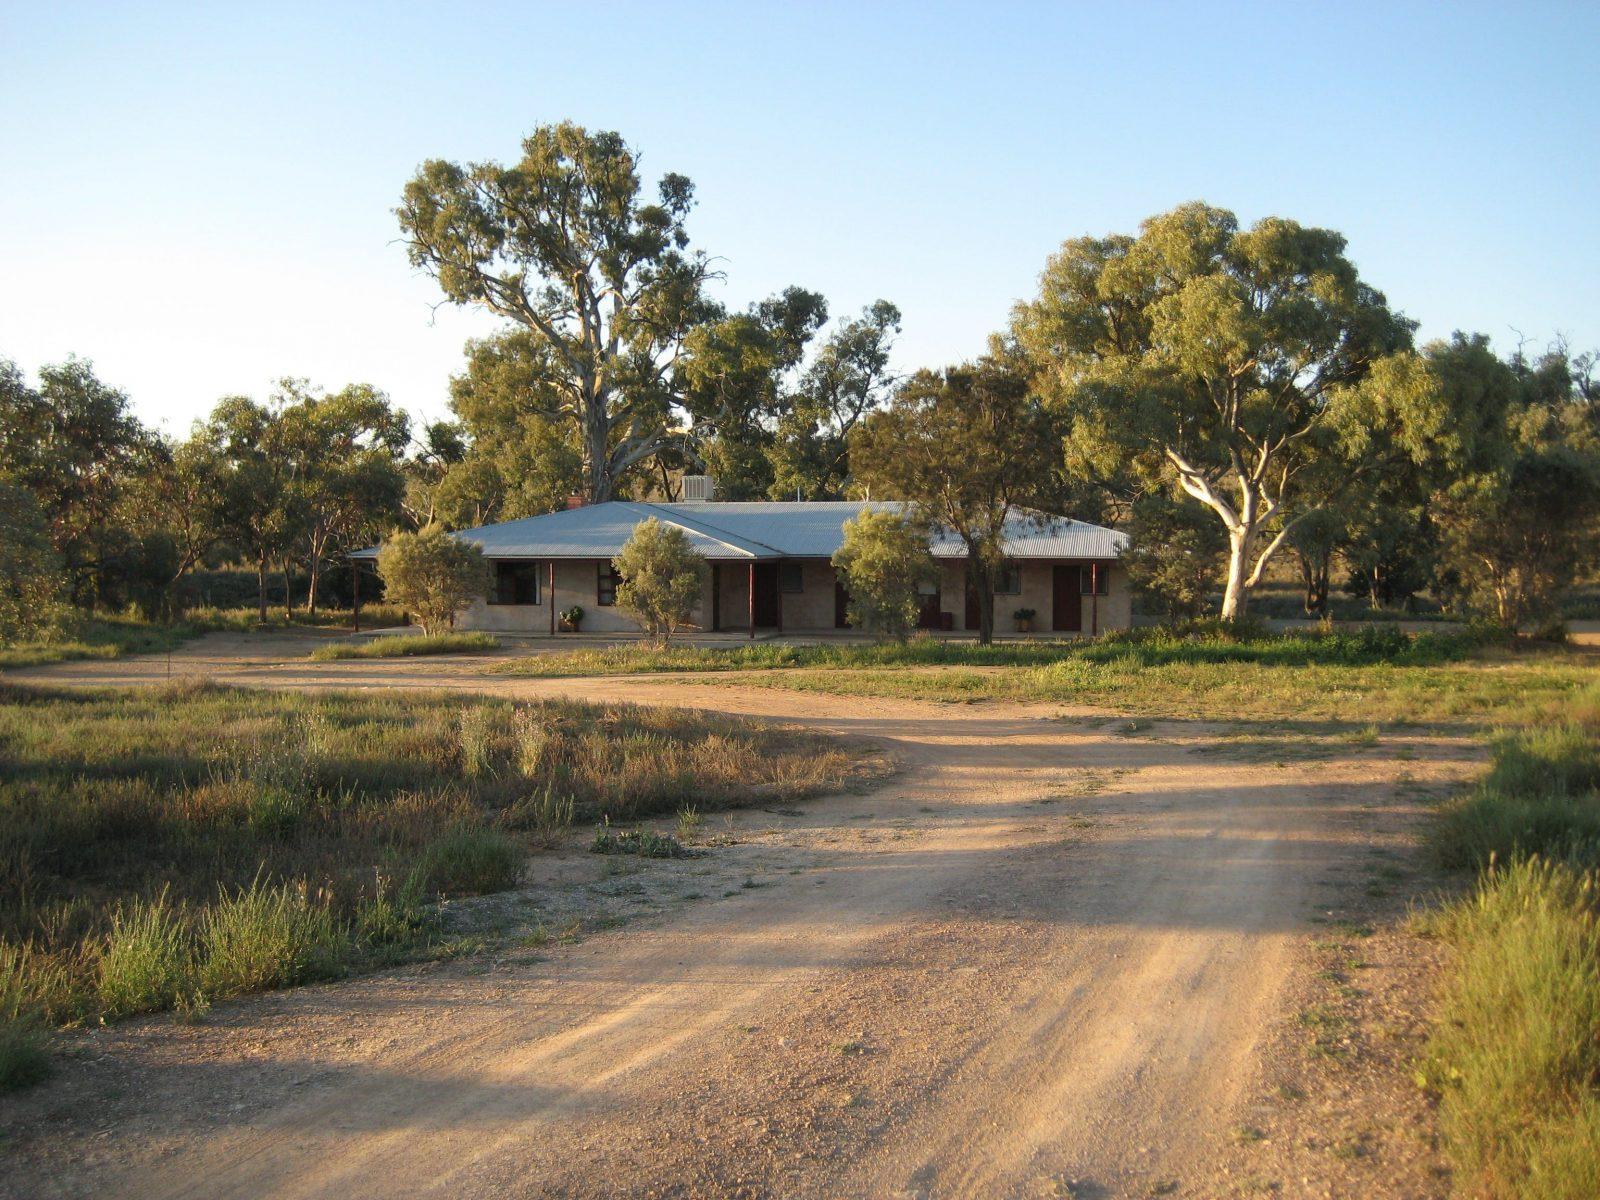 Shearer's Quarters, Gum Creek Station Blinman